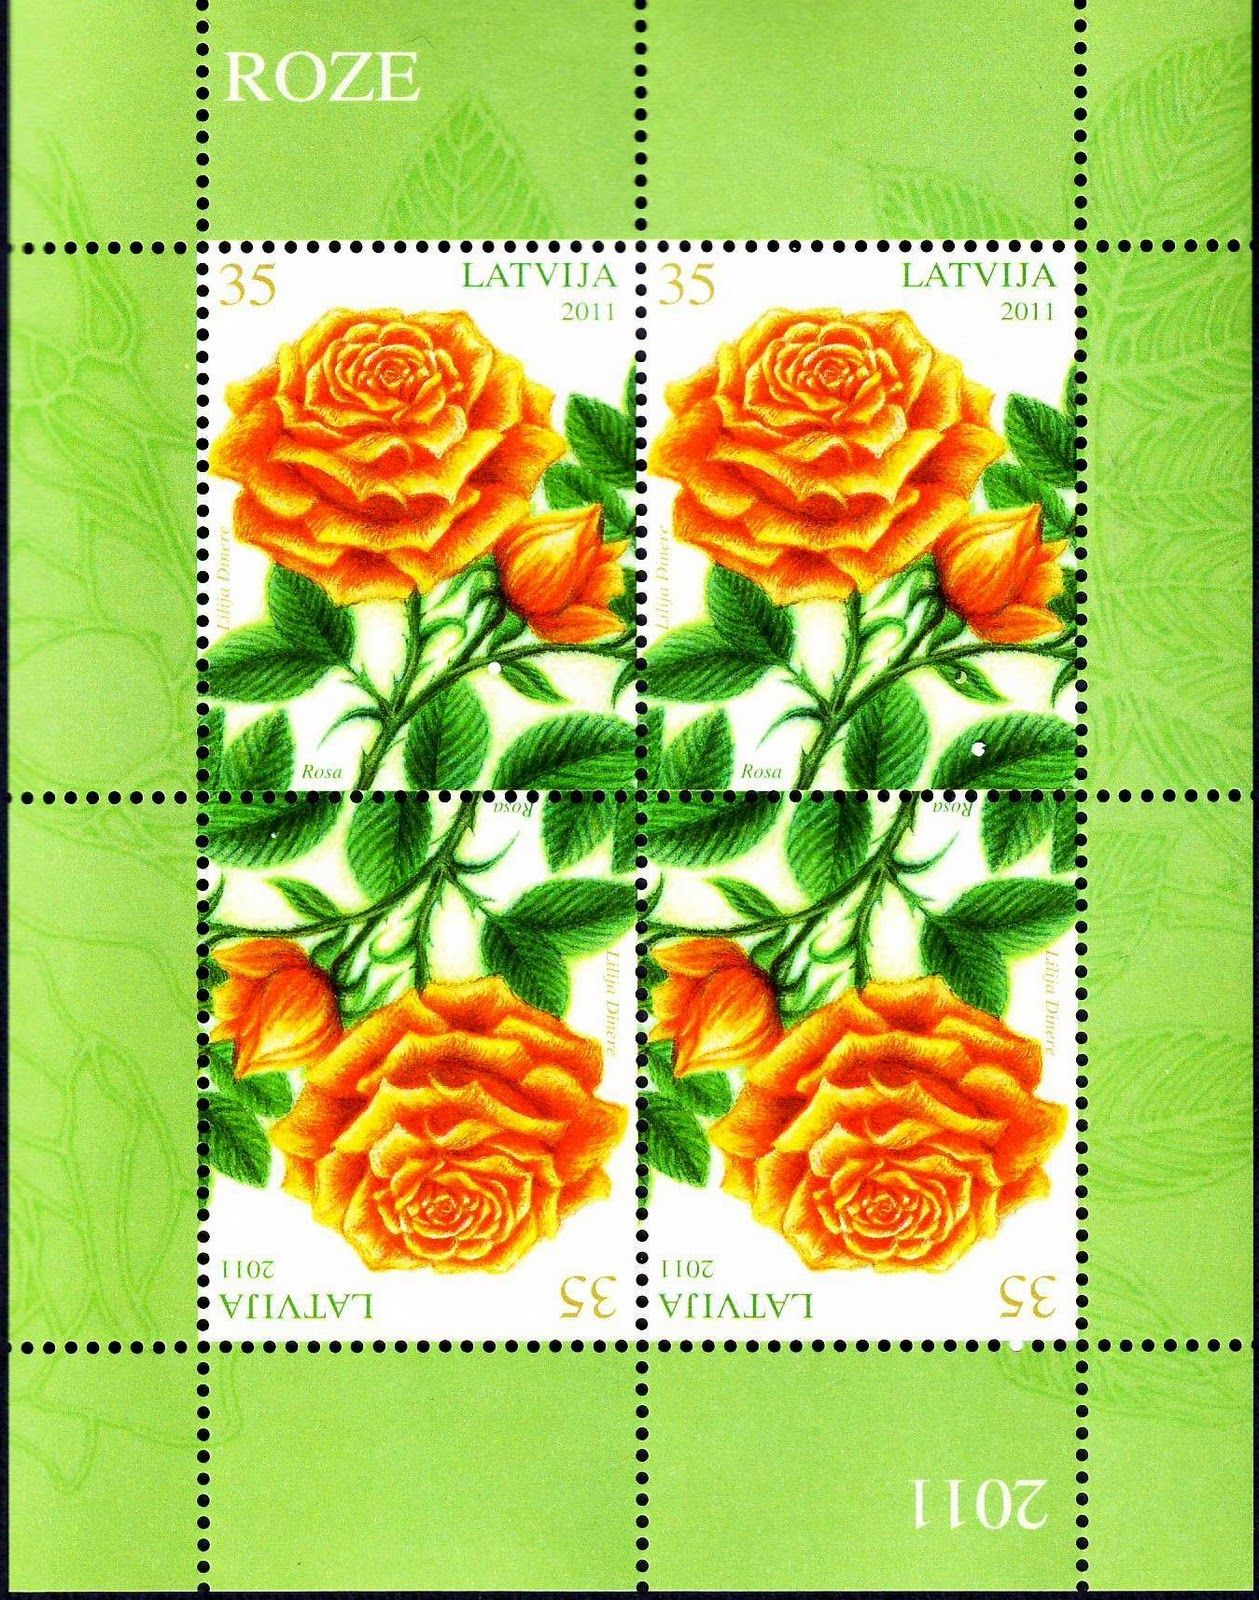 Latvia Stamps - Flowers